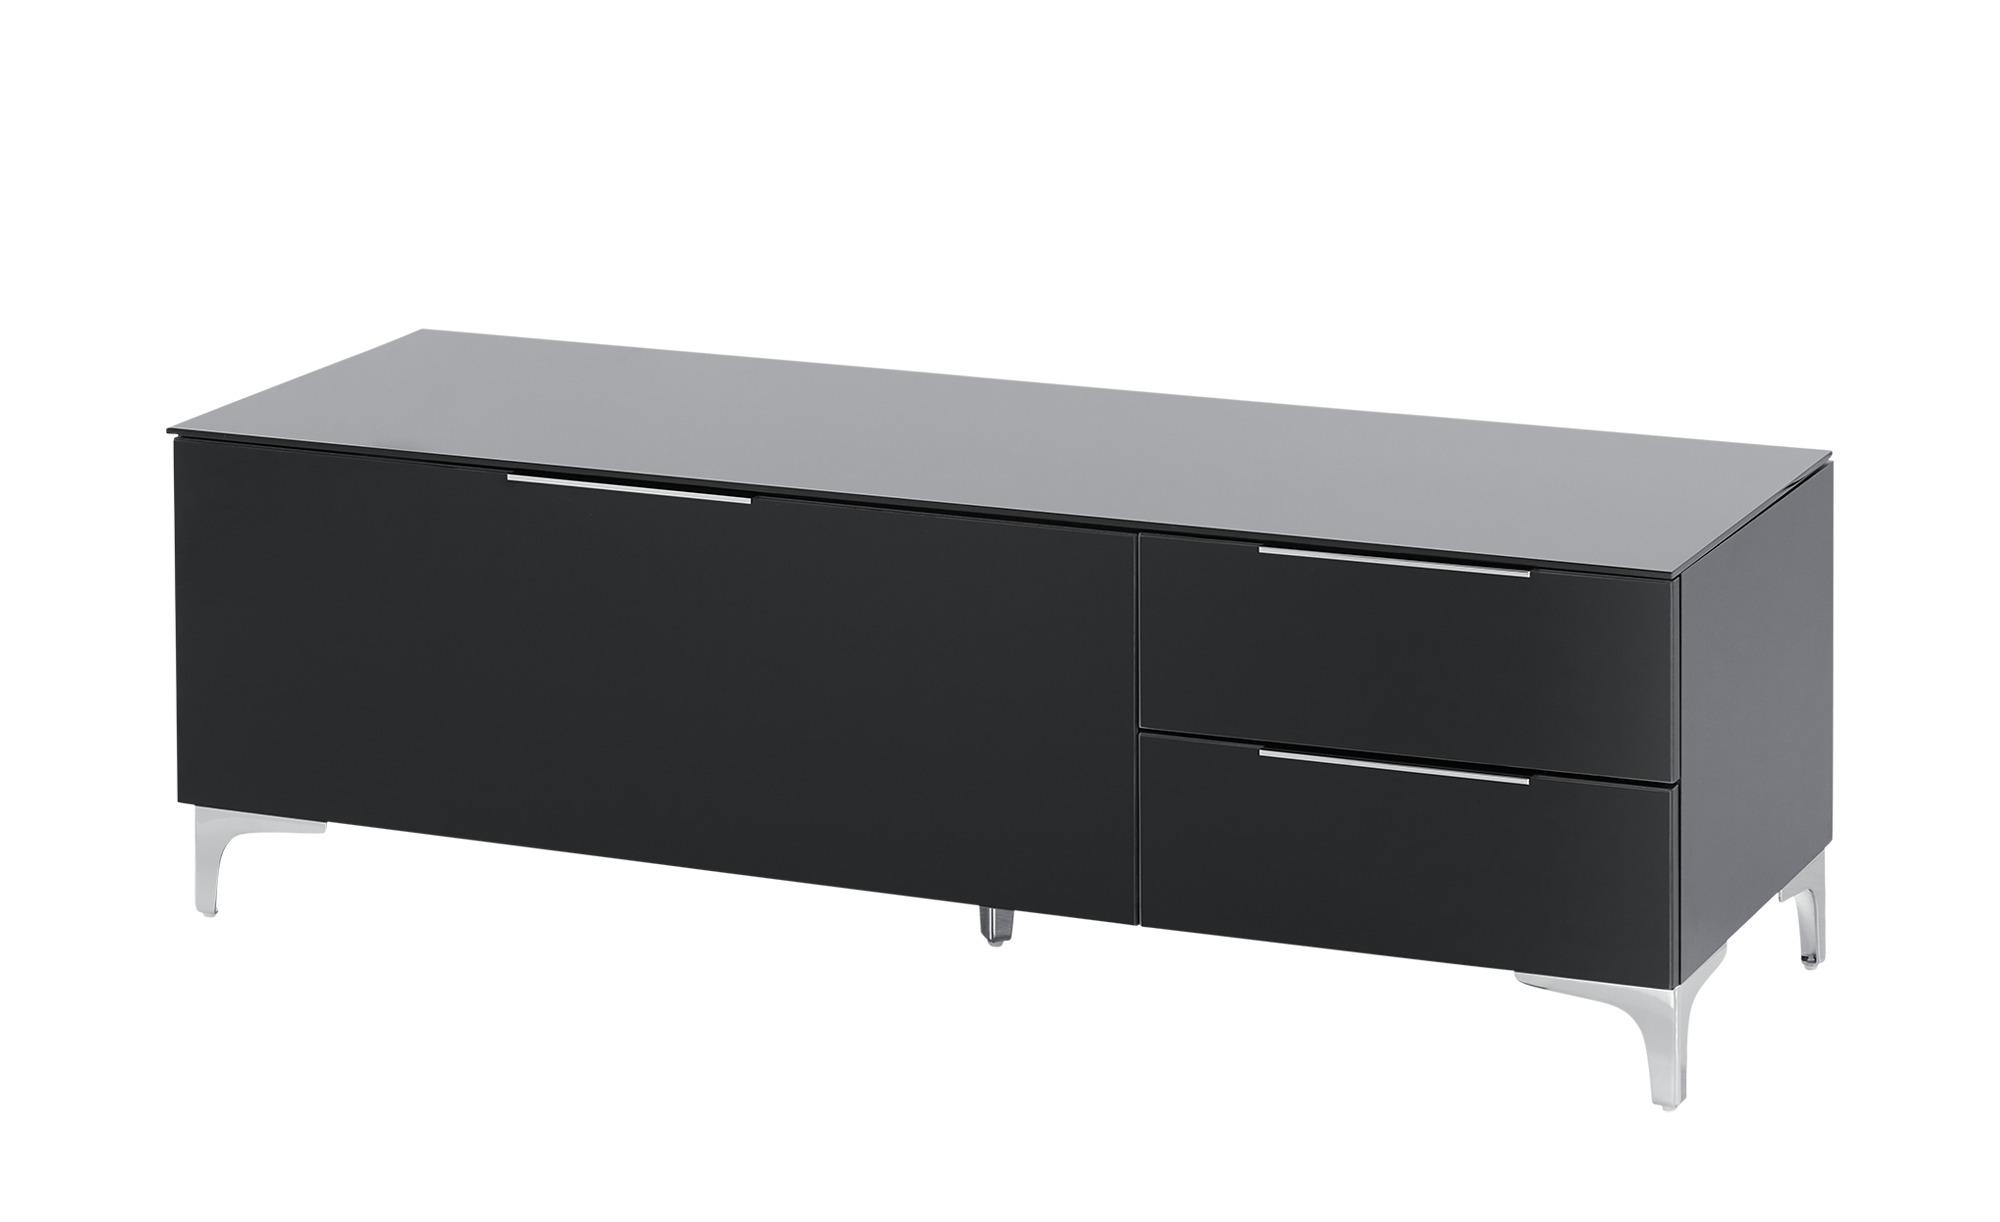 Lowboard  Mendig II ¦ schwarz ¦ Maße (cm): B: 135 H: 44 T: 46 TV- & Media Möbel > TV-Racks - Höffner